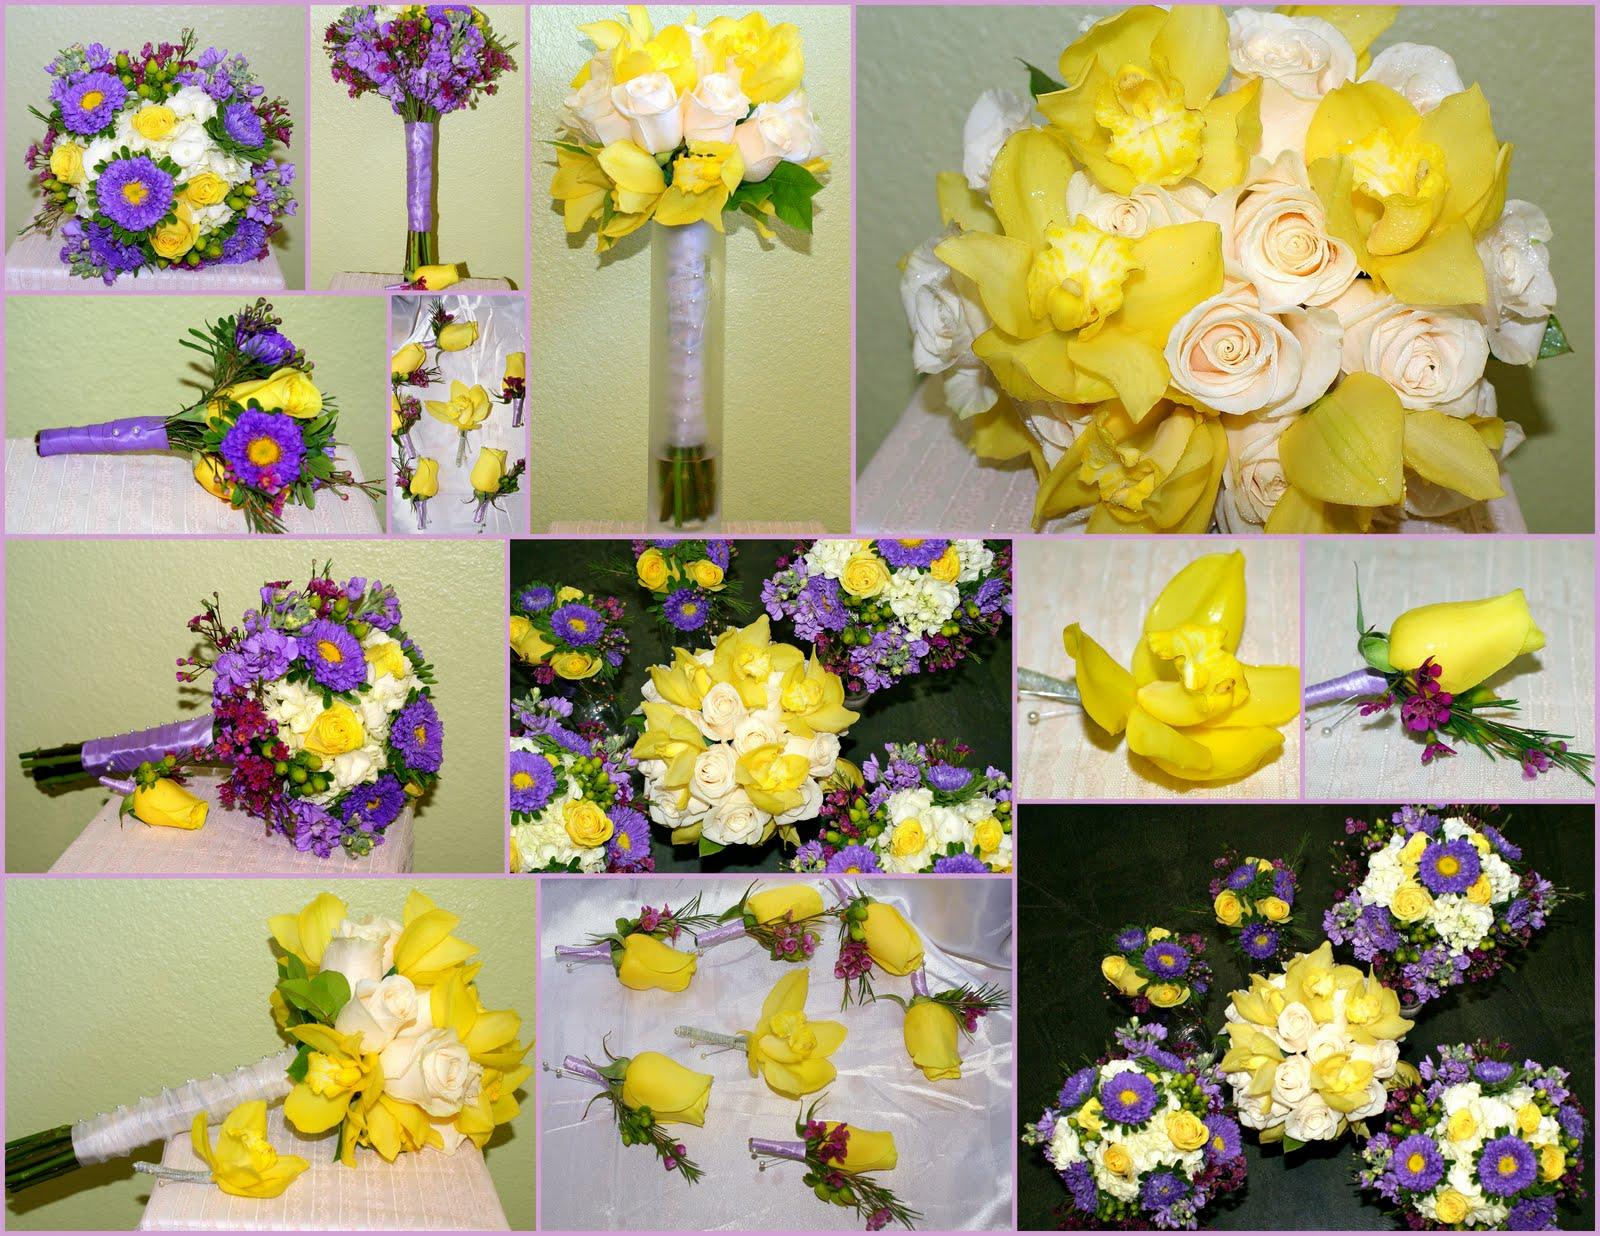 LeLe Floral: Yellow, White & Lavender 40th Wedding Anniversary